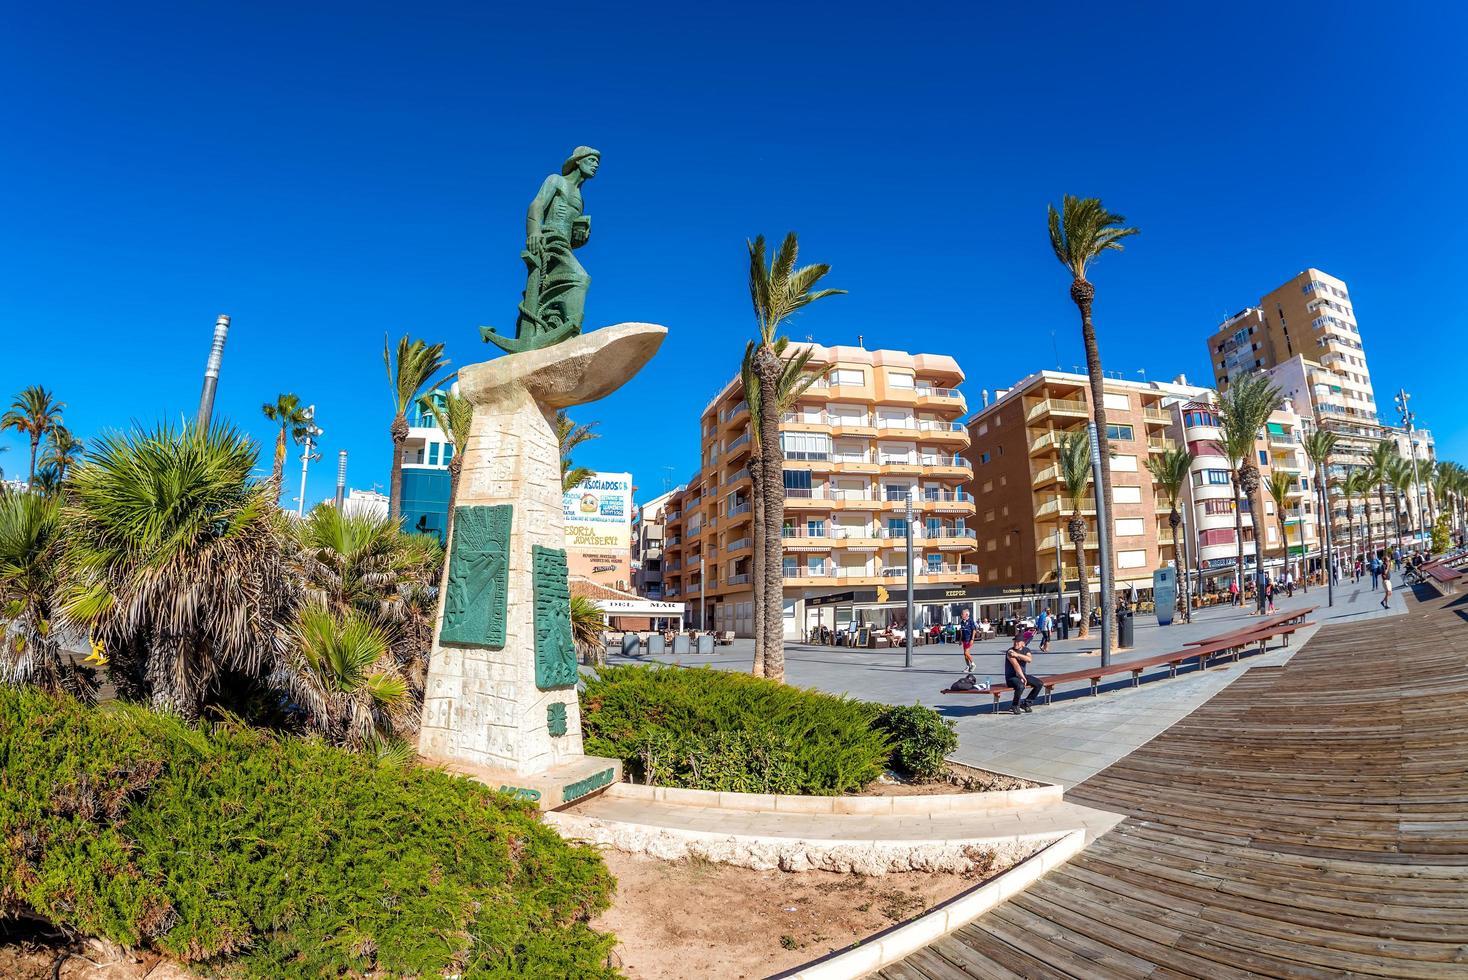 torrevieja, spanien 2017 - man of the sea staty på paseo juan aparicio foto